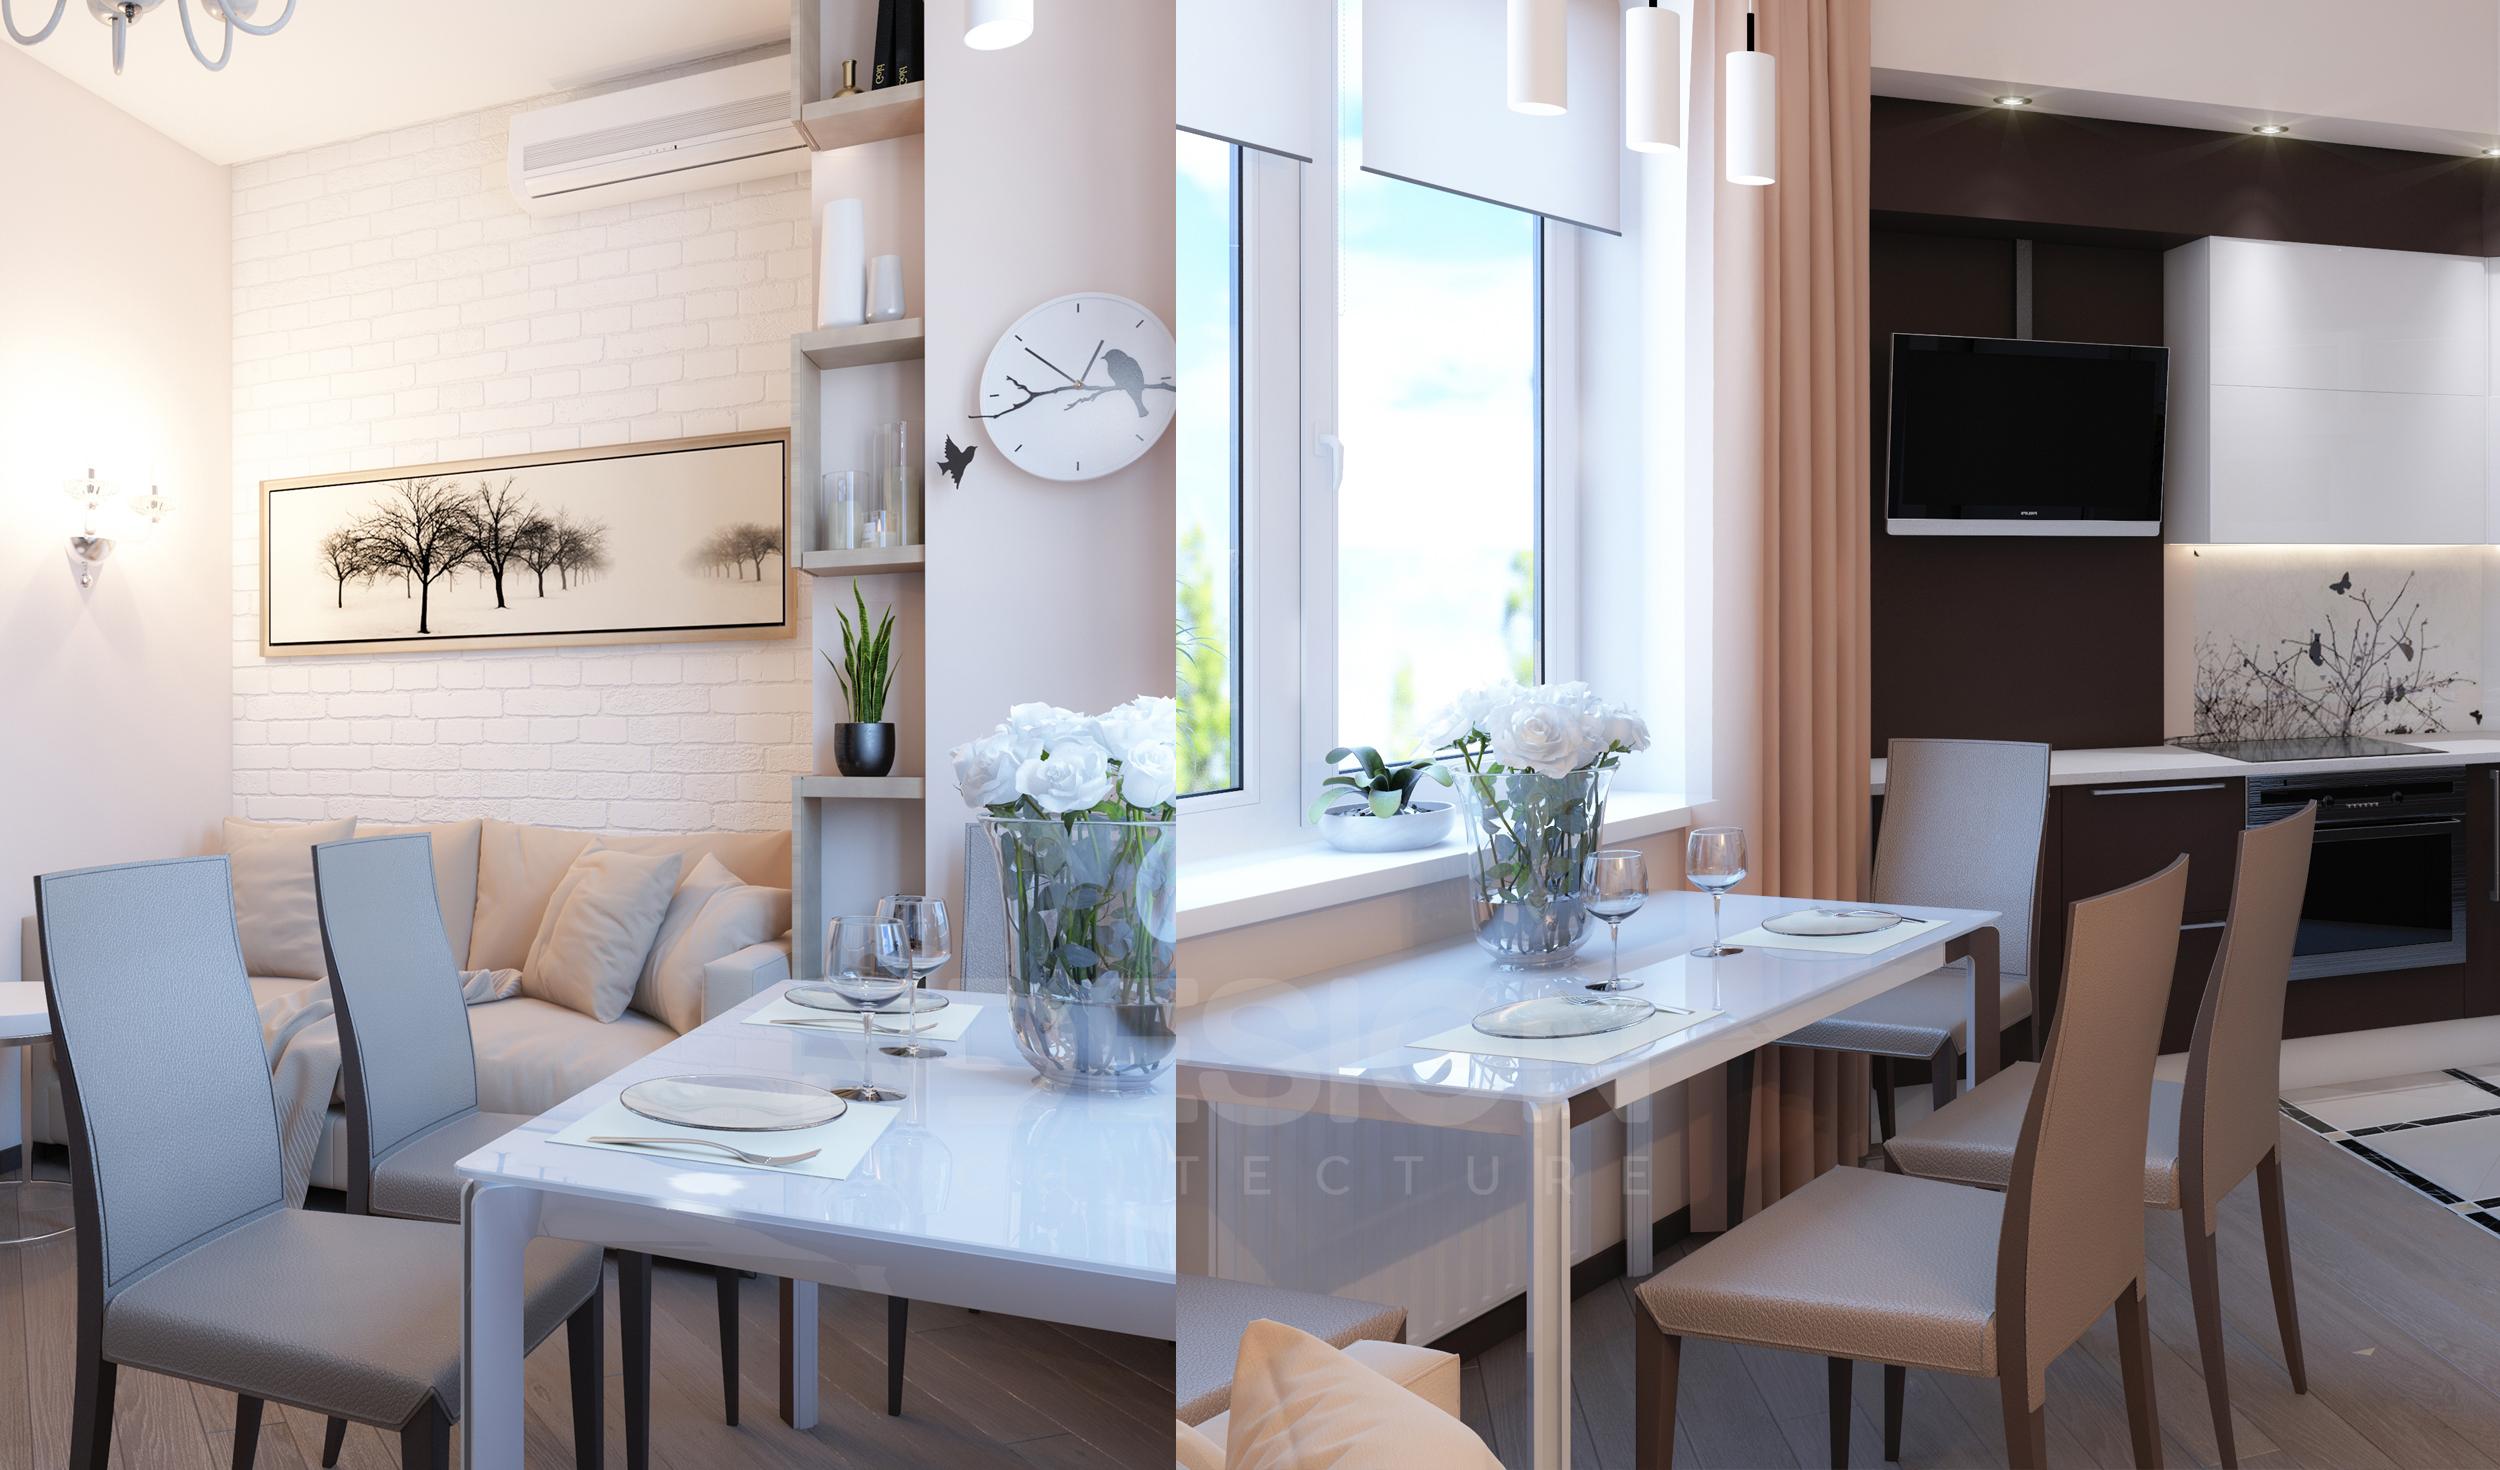 ЖК Obolon Tower - Кухня